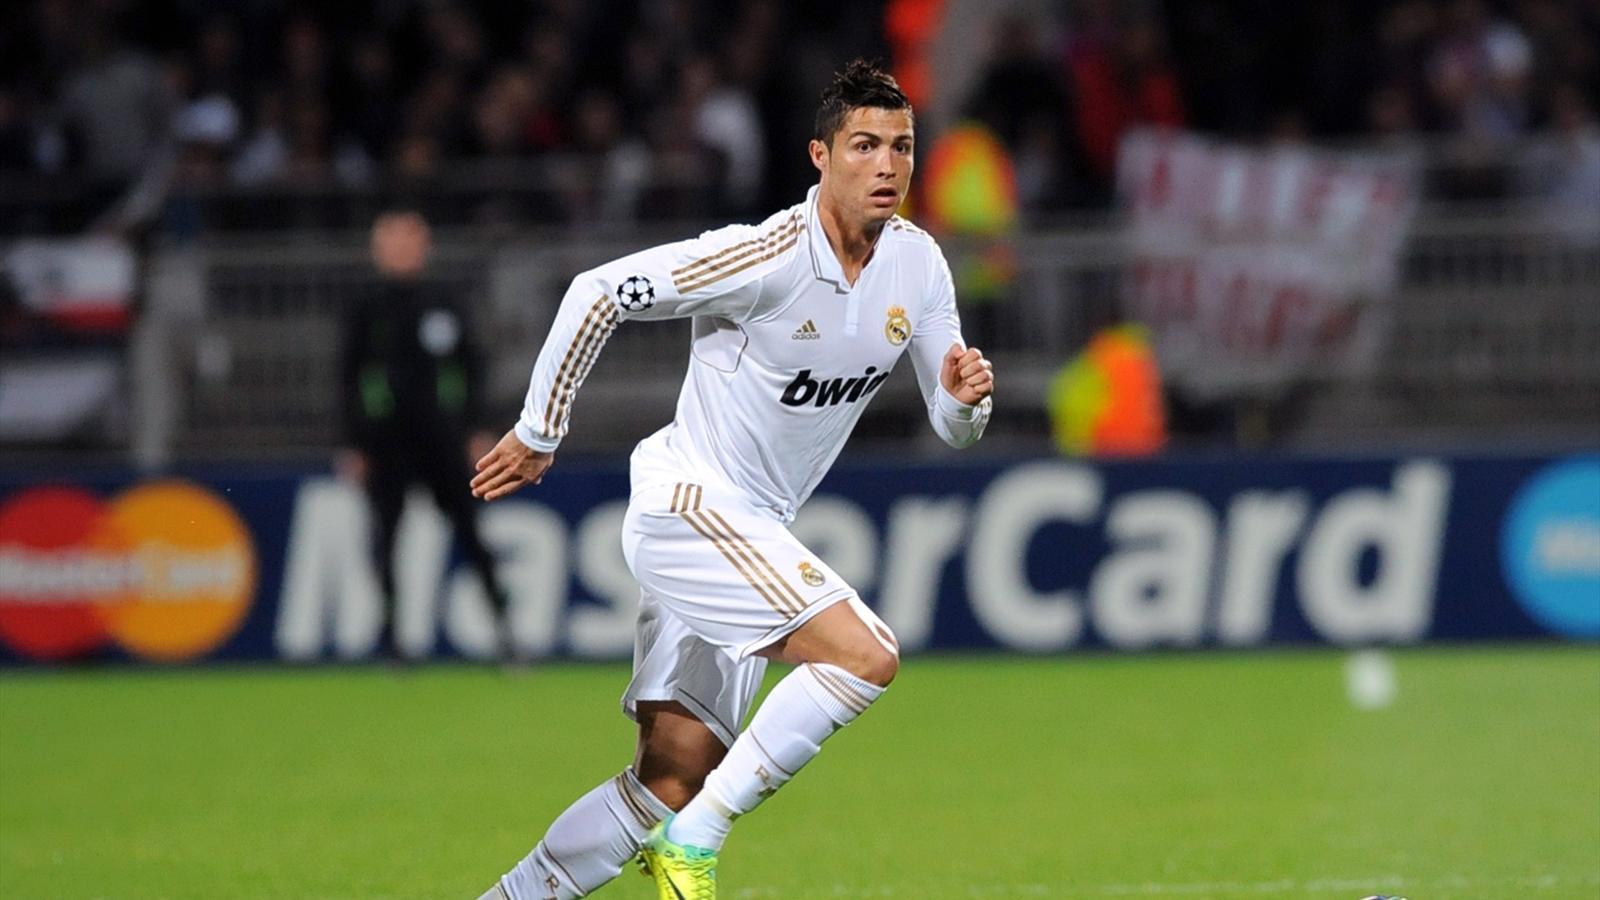 Cristiano Ronaldo (Real Madrid) face à Lyon (saison 2011-2012)